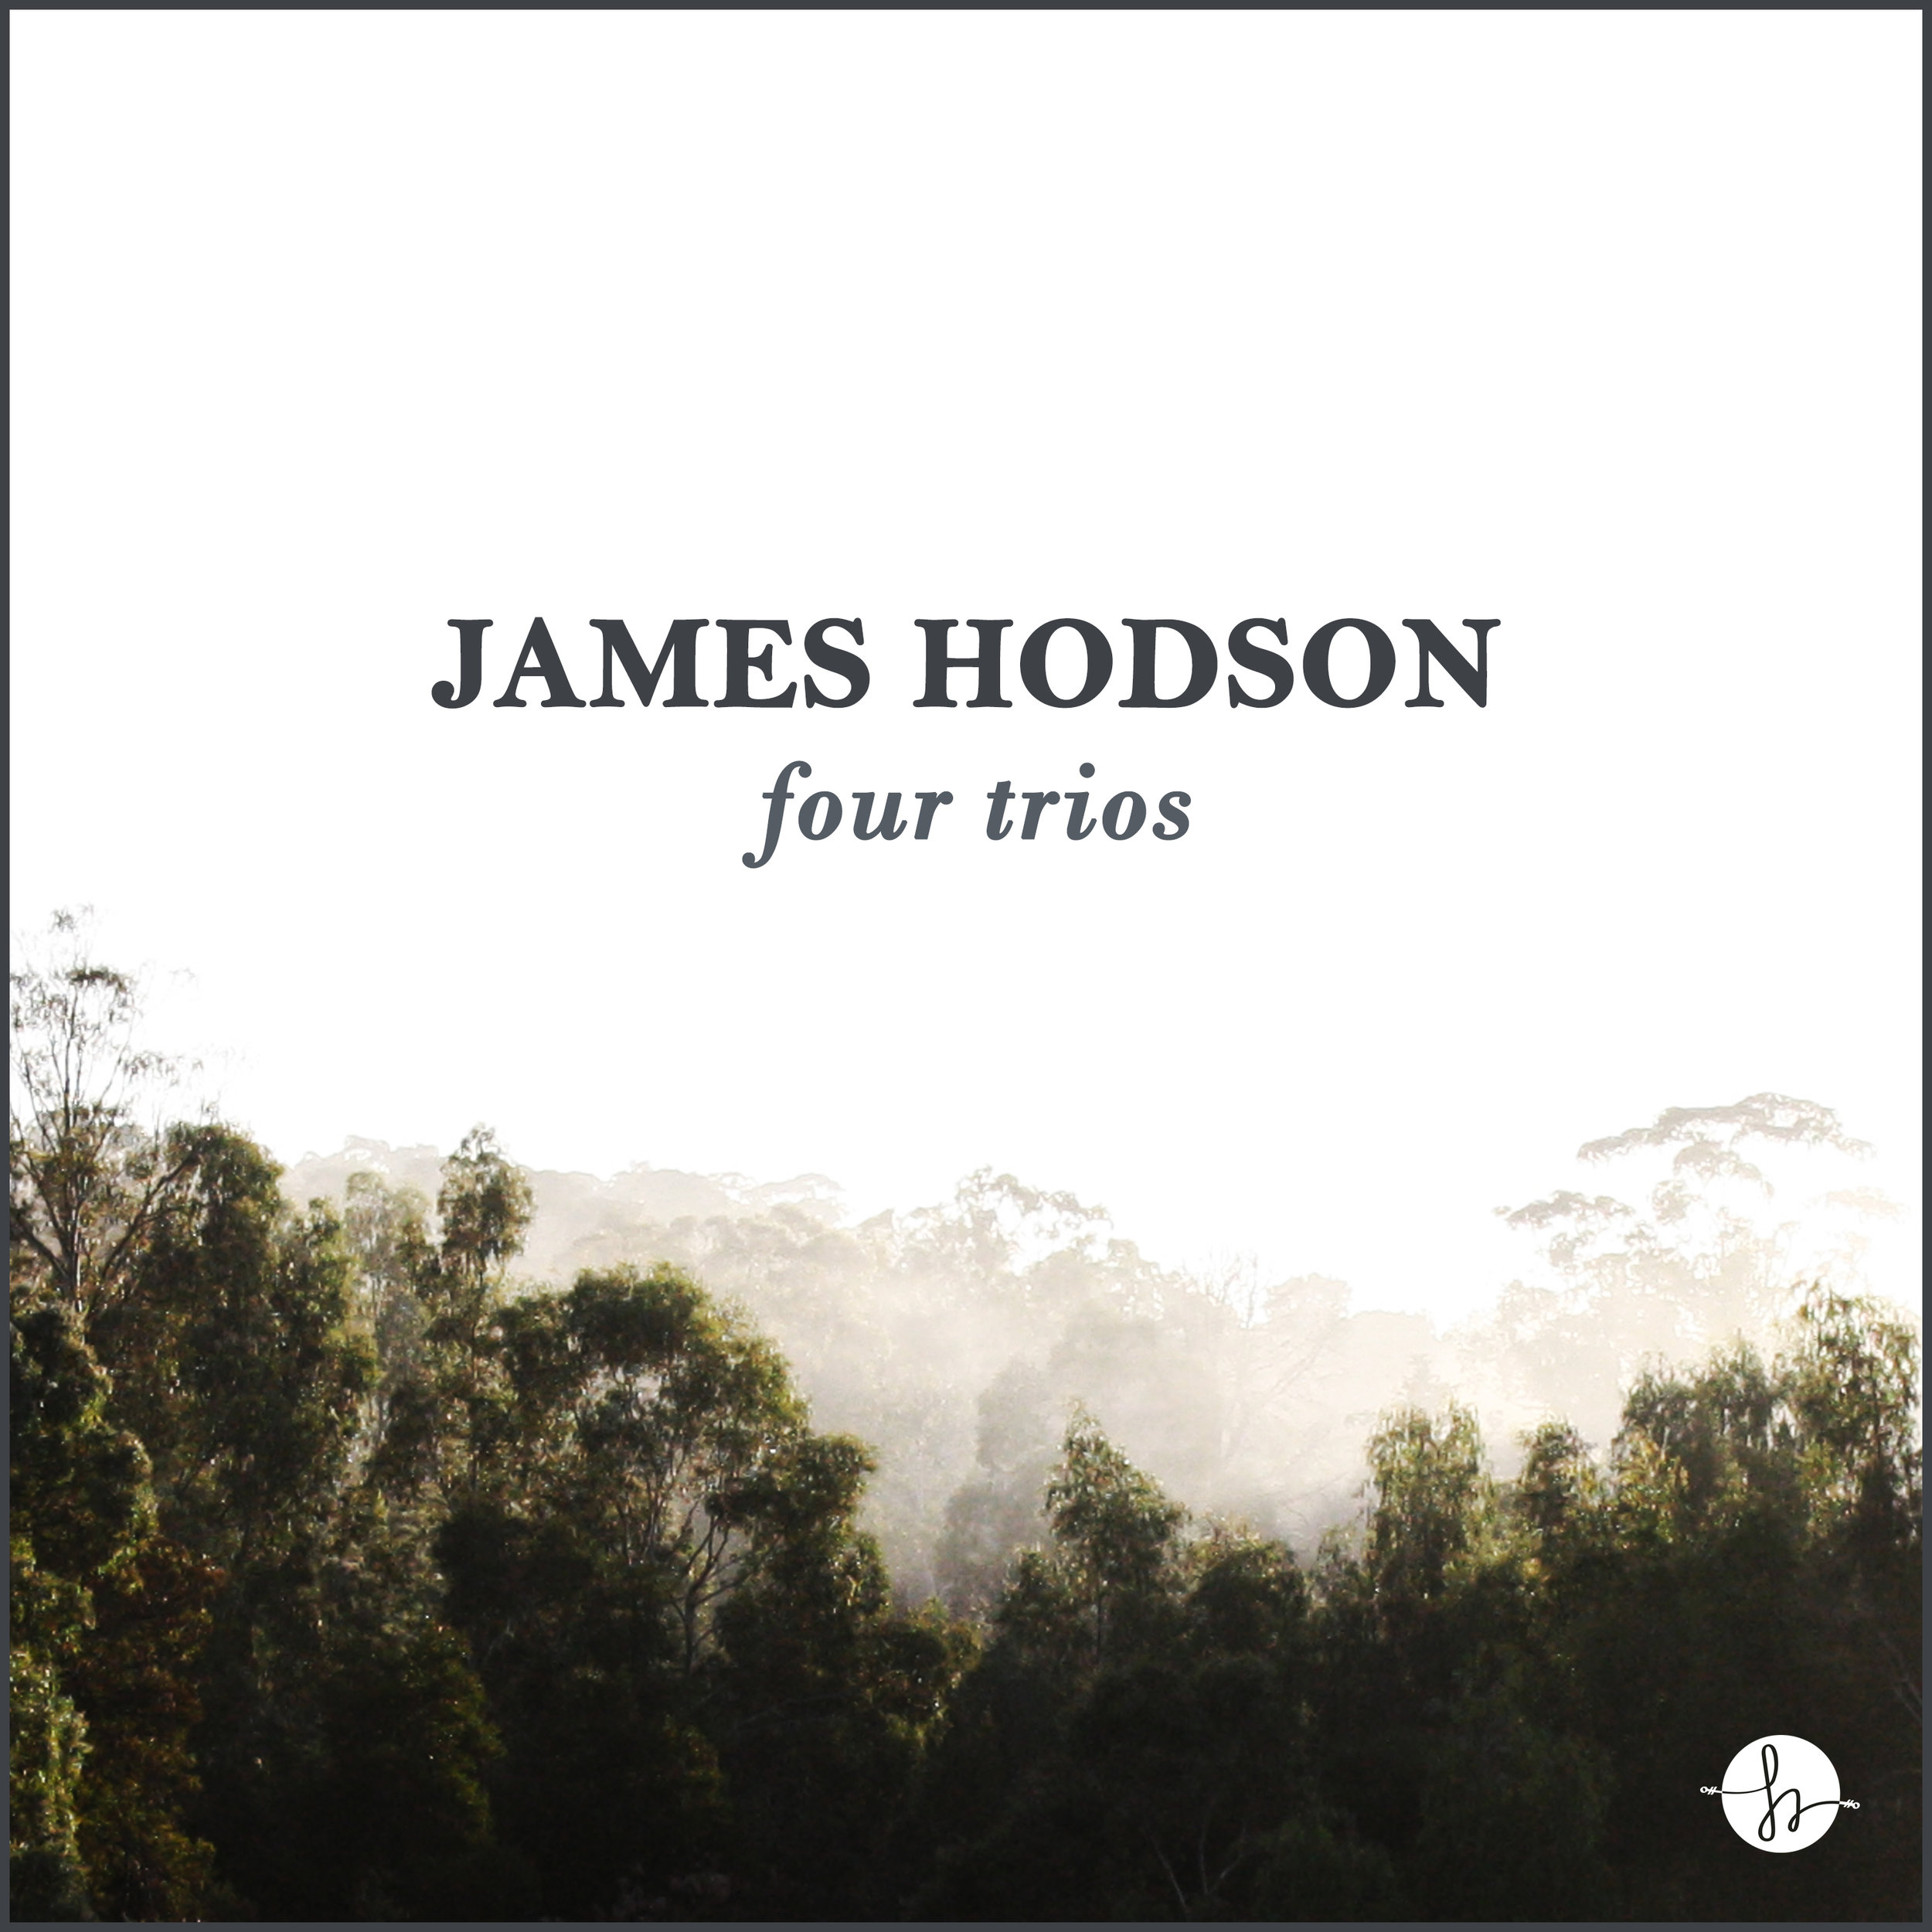 James Hodson Four Trios cover w border.jpg